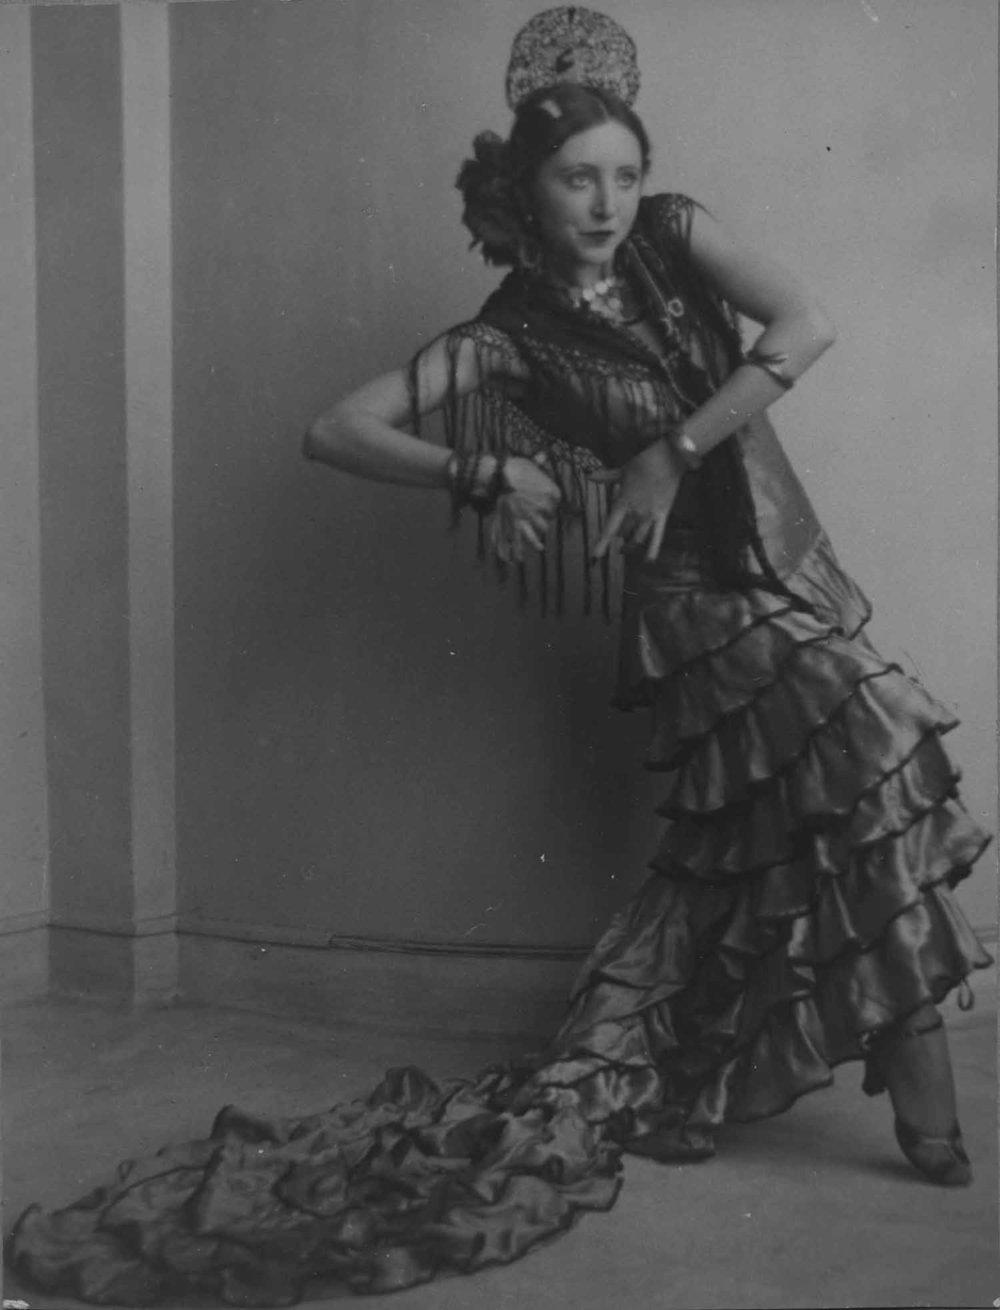 Anais 1928- dance pose.jpg